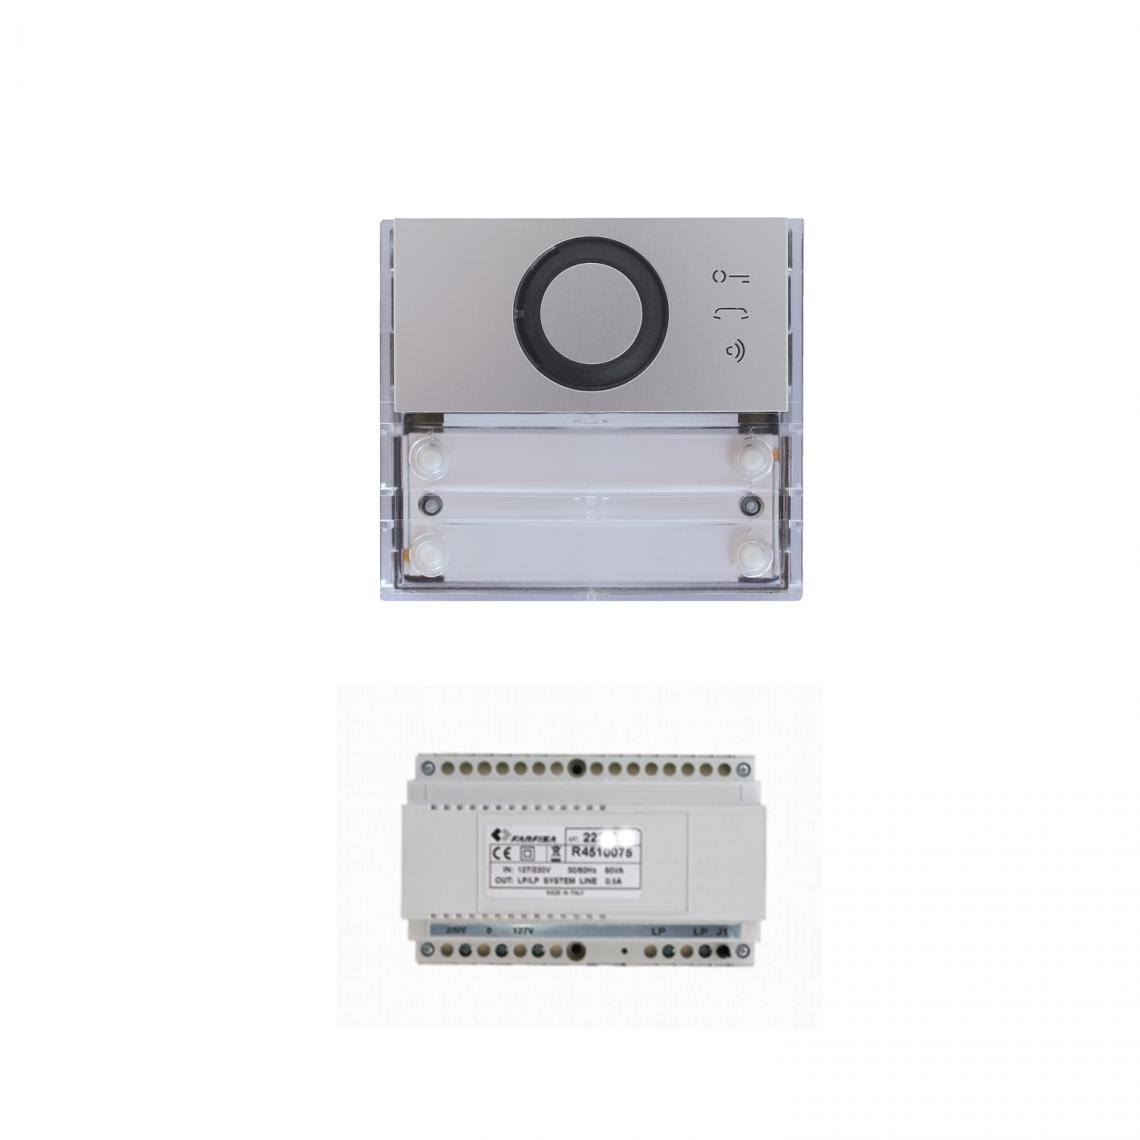 Audio kit basic installation - KIT BAAB